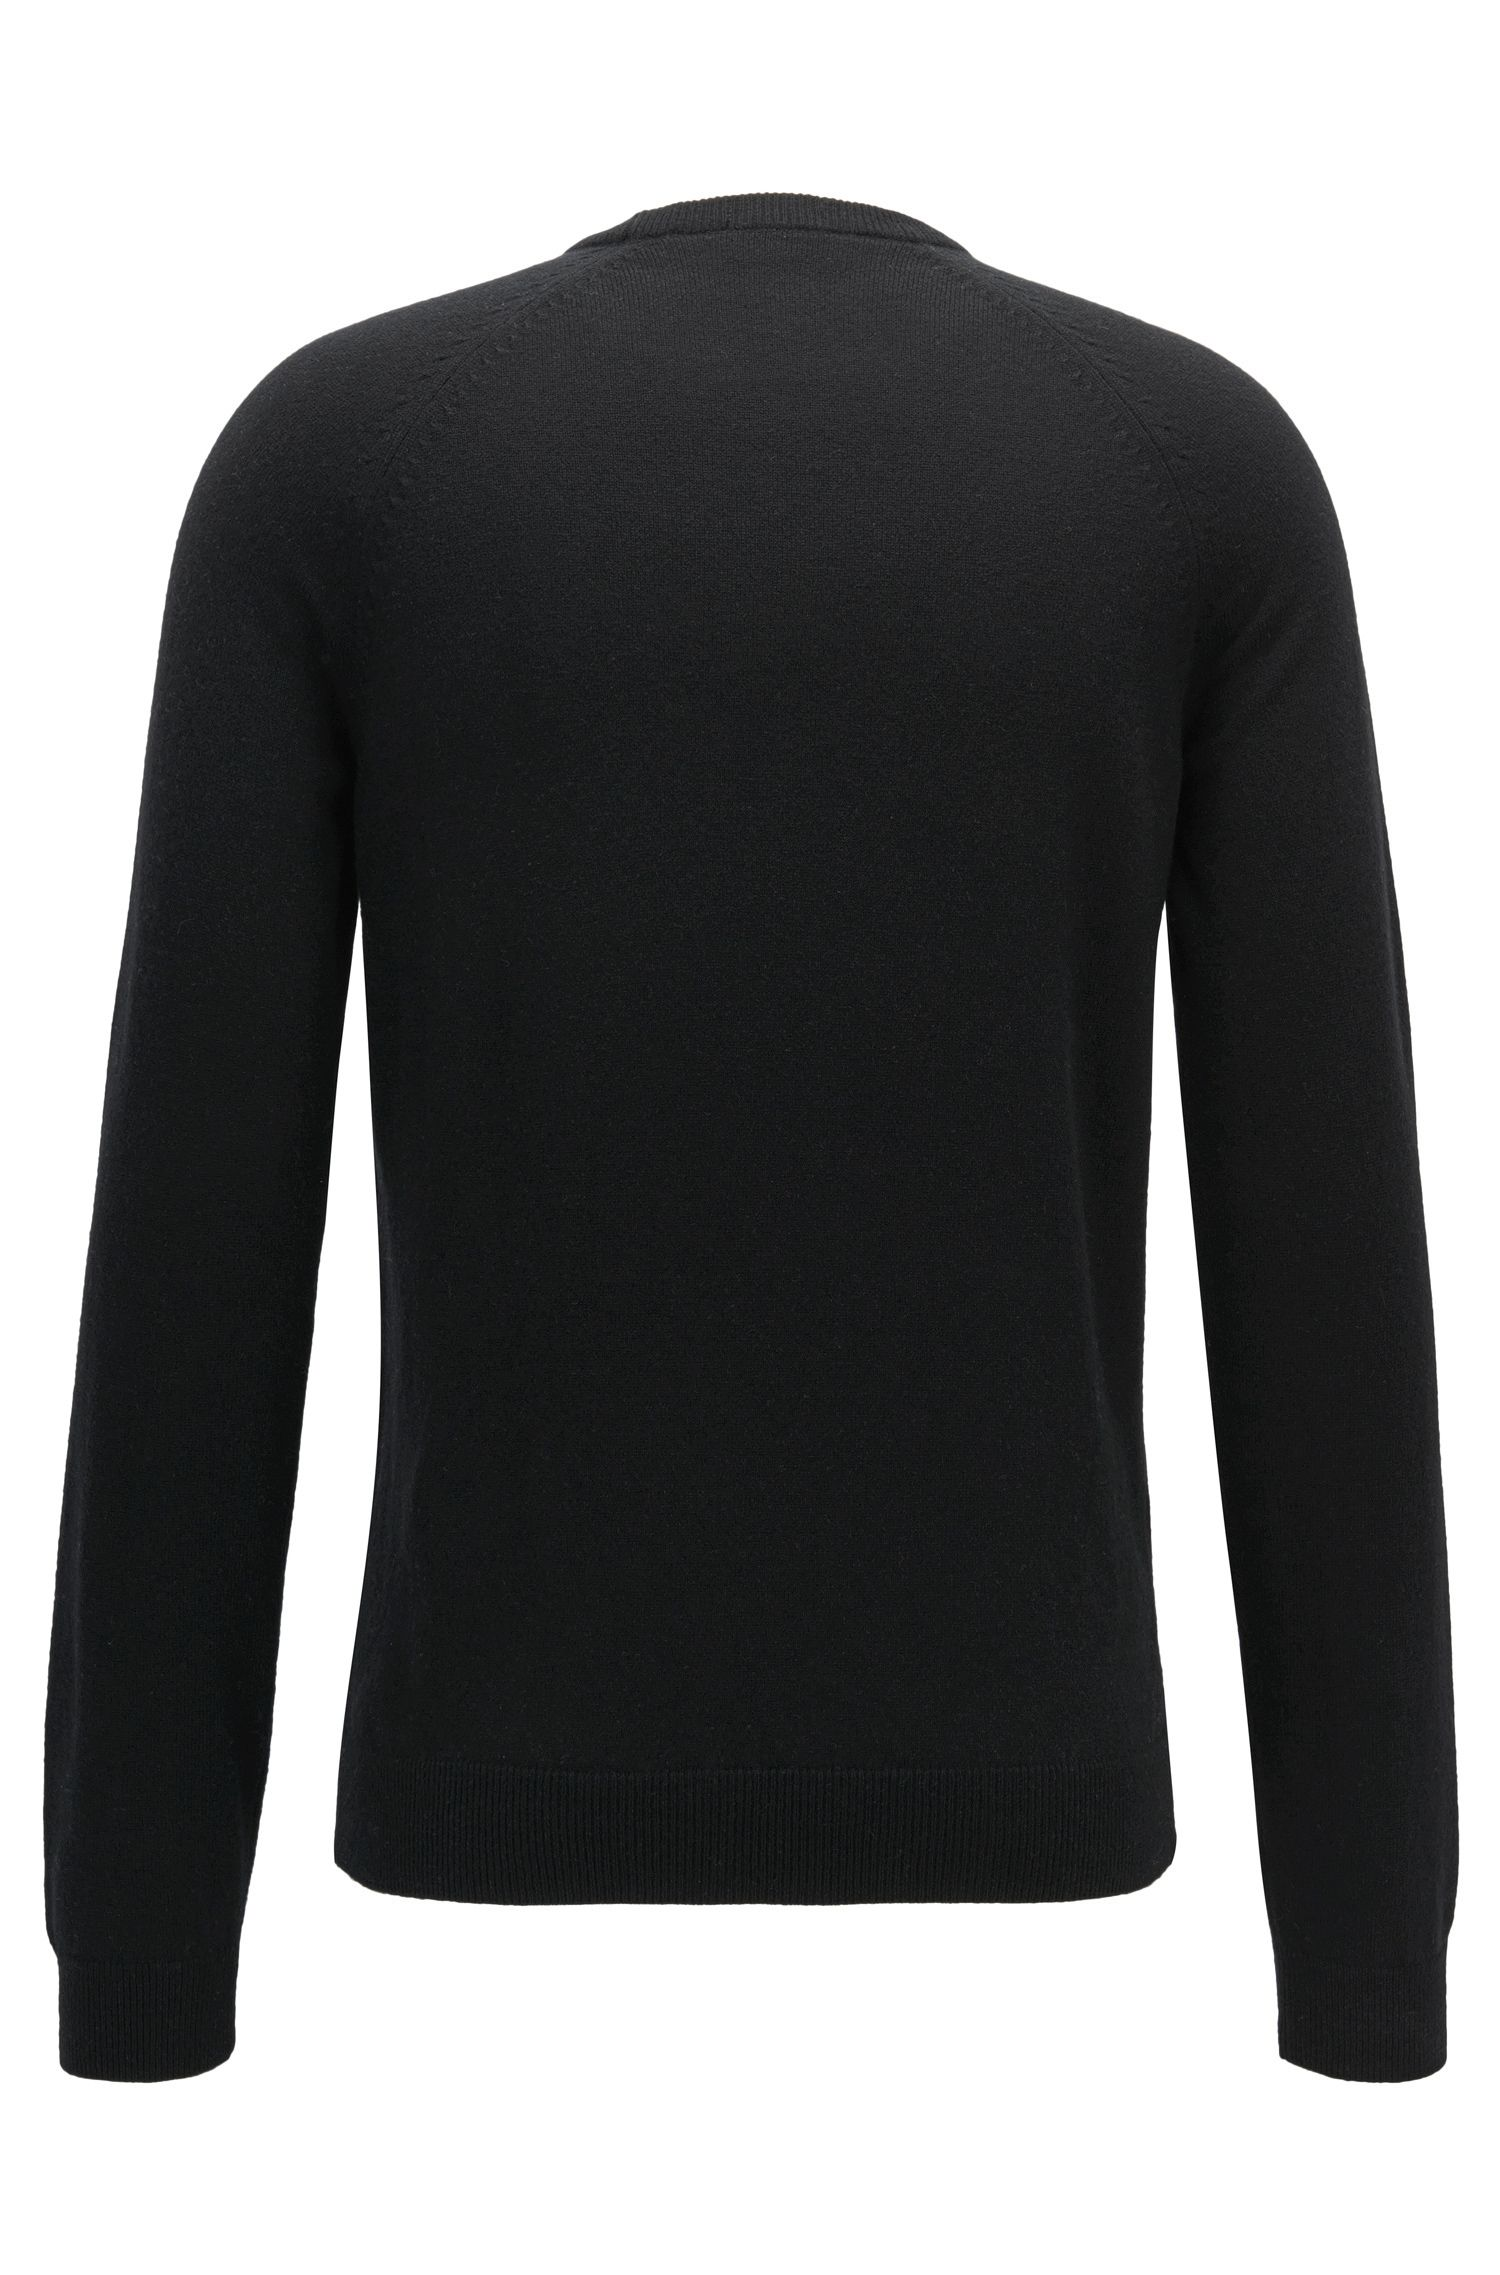 Wool Silk Cashmere Sweater | Play PF